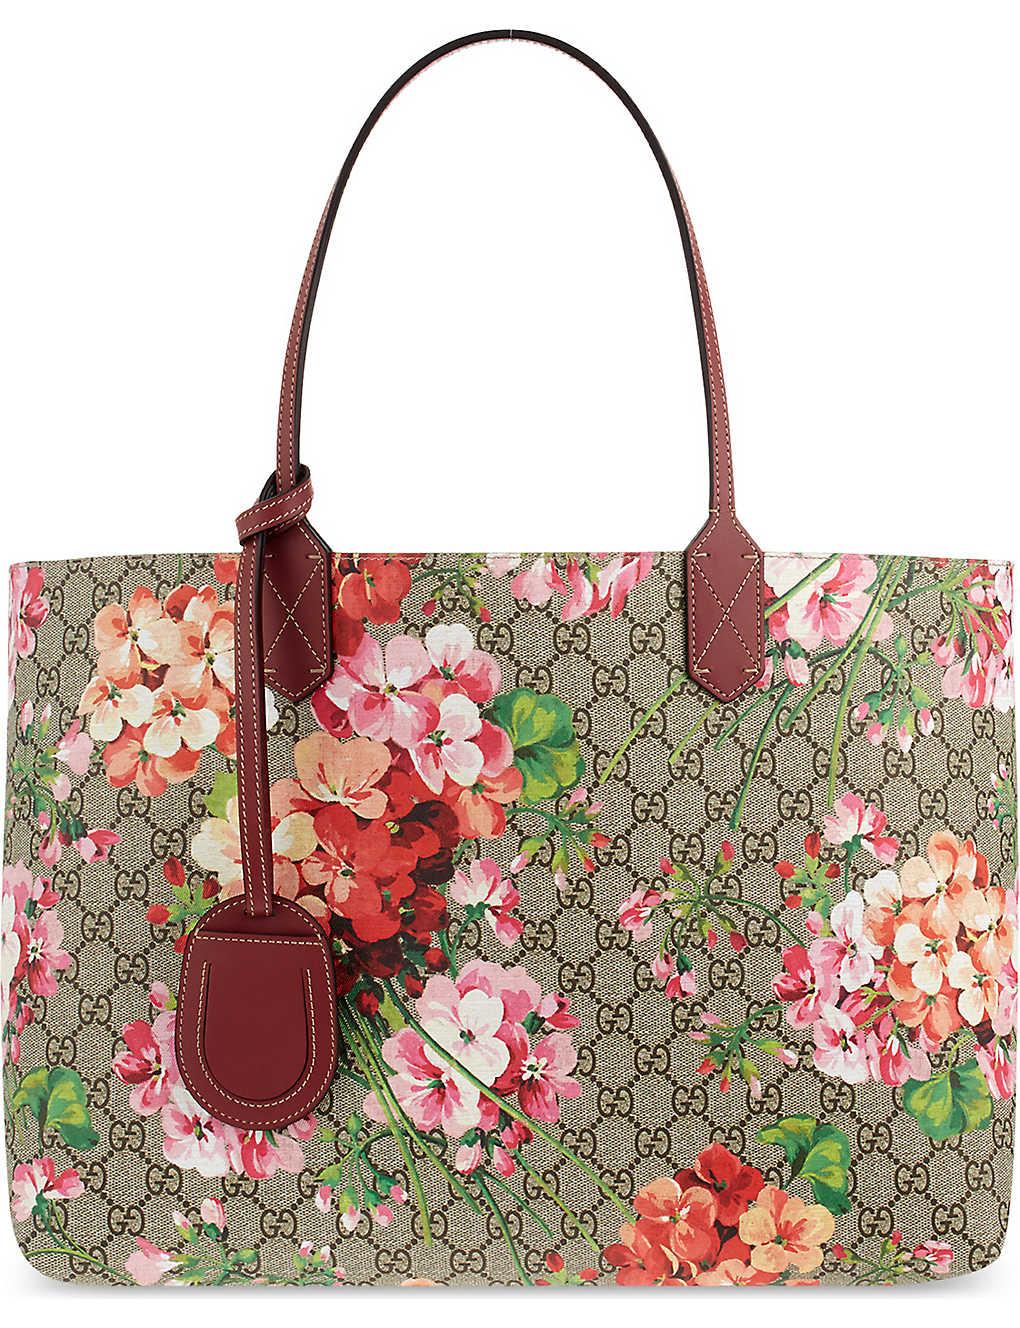 57ed59b8ced4 GUCCI - Reversible floral logo leather shopper bag